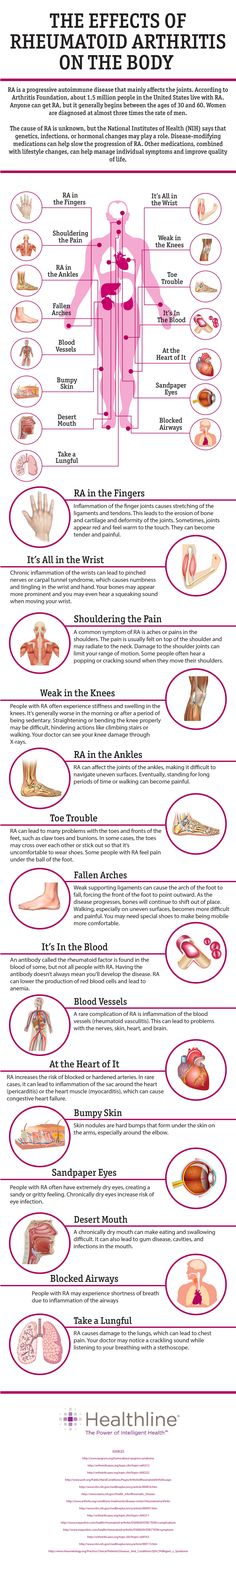 Effects of Rheumatoid Arthritis on the Body